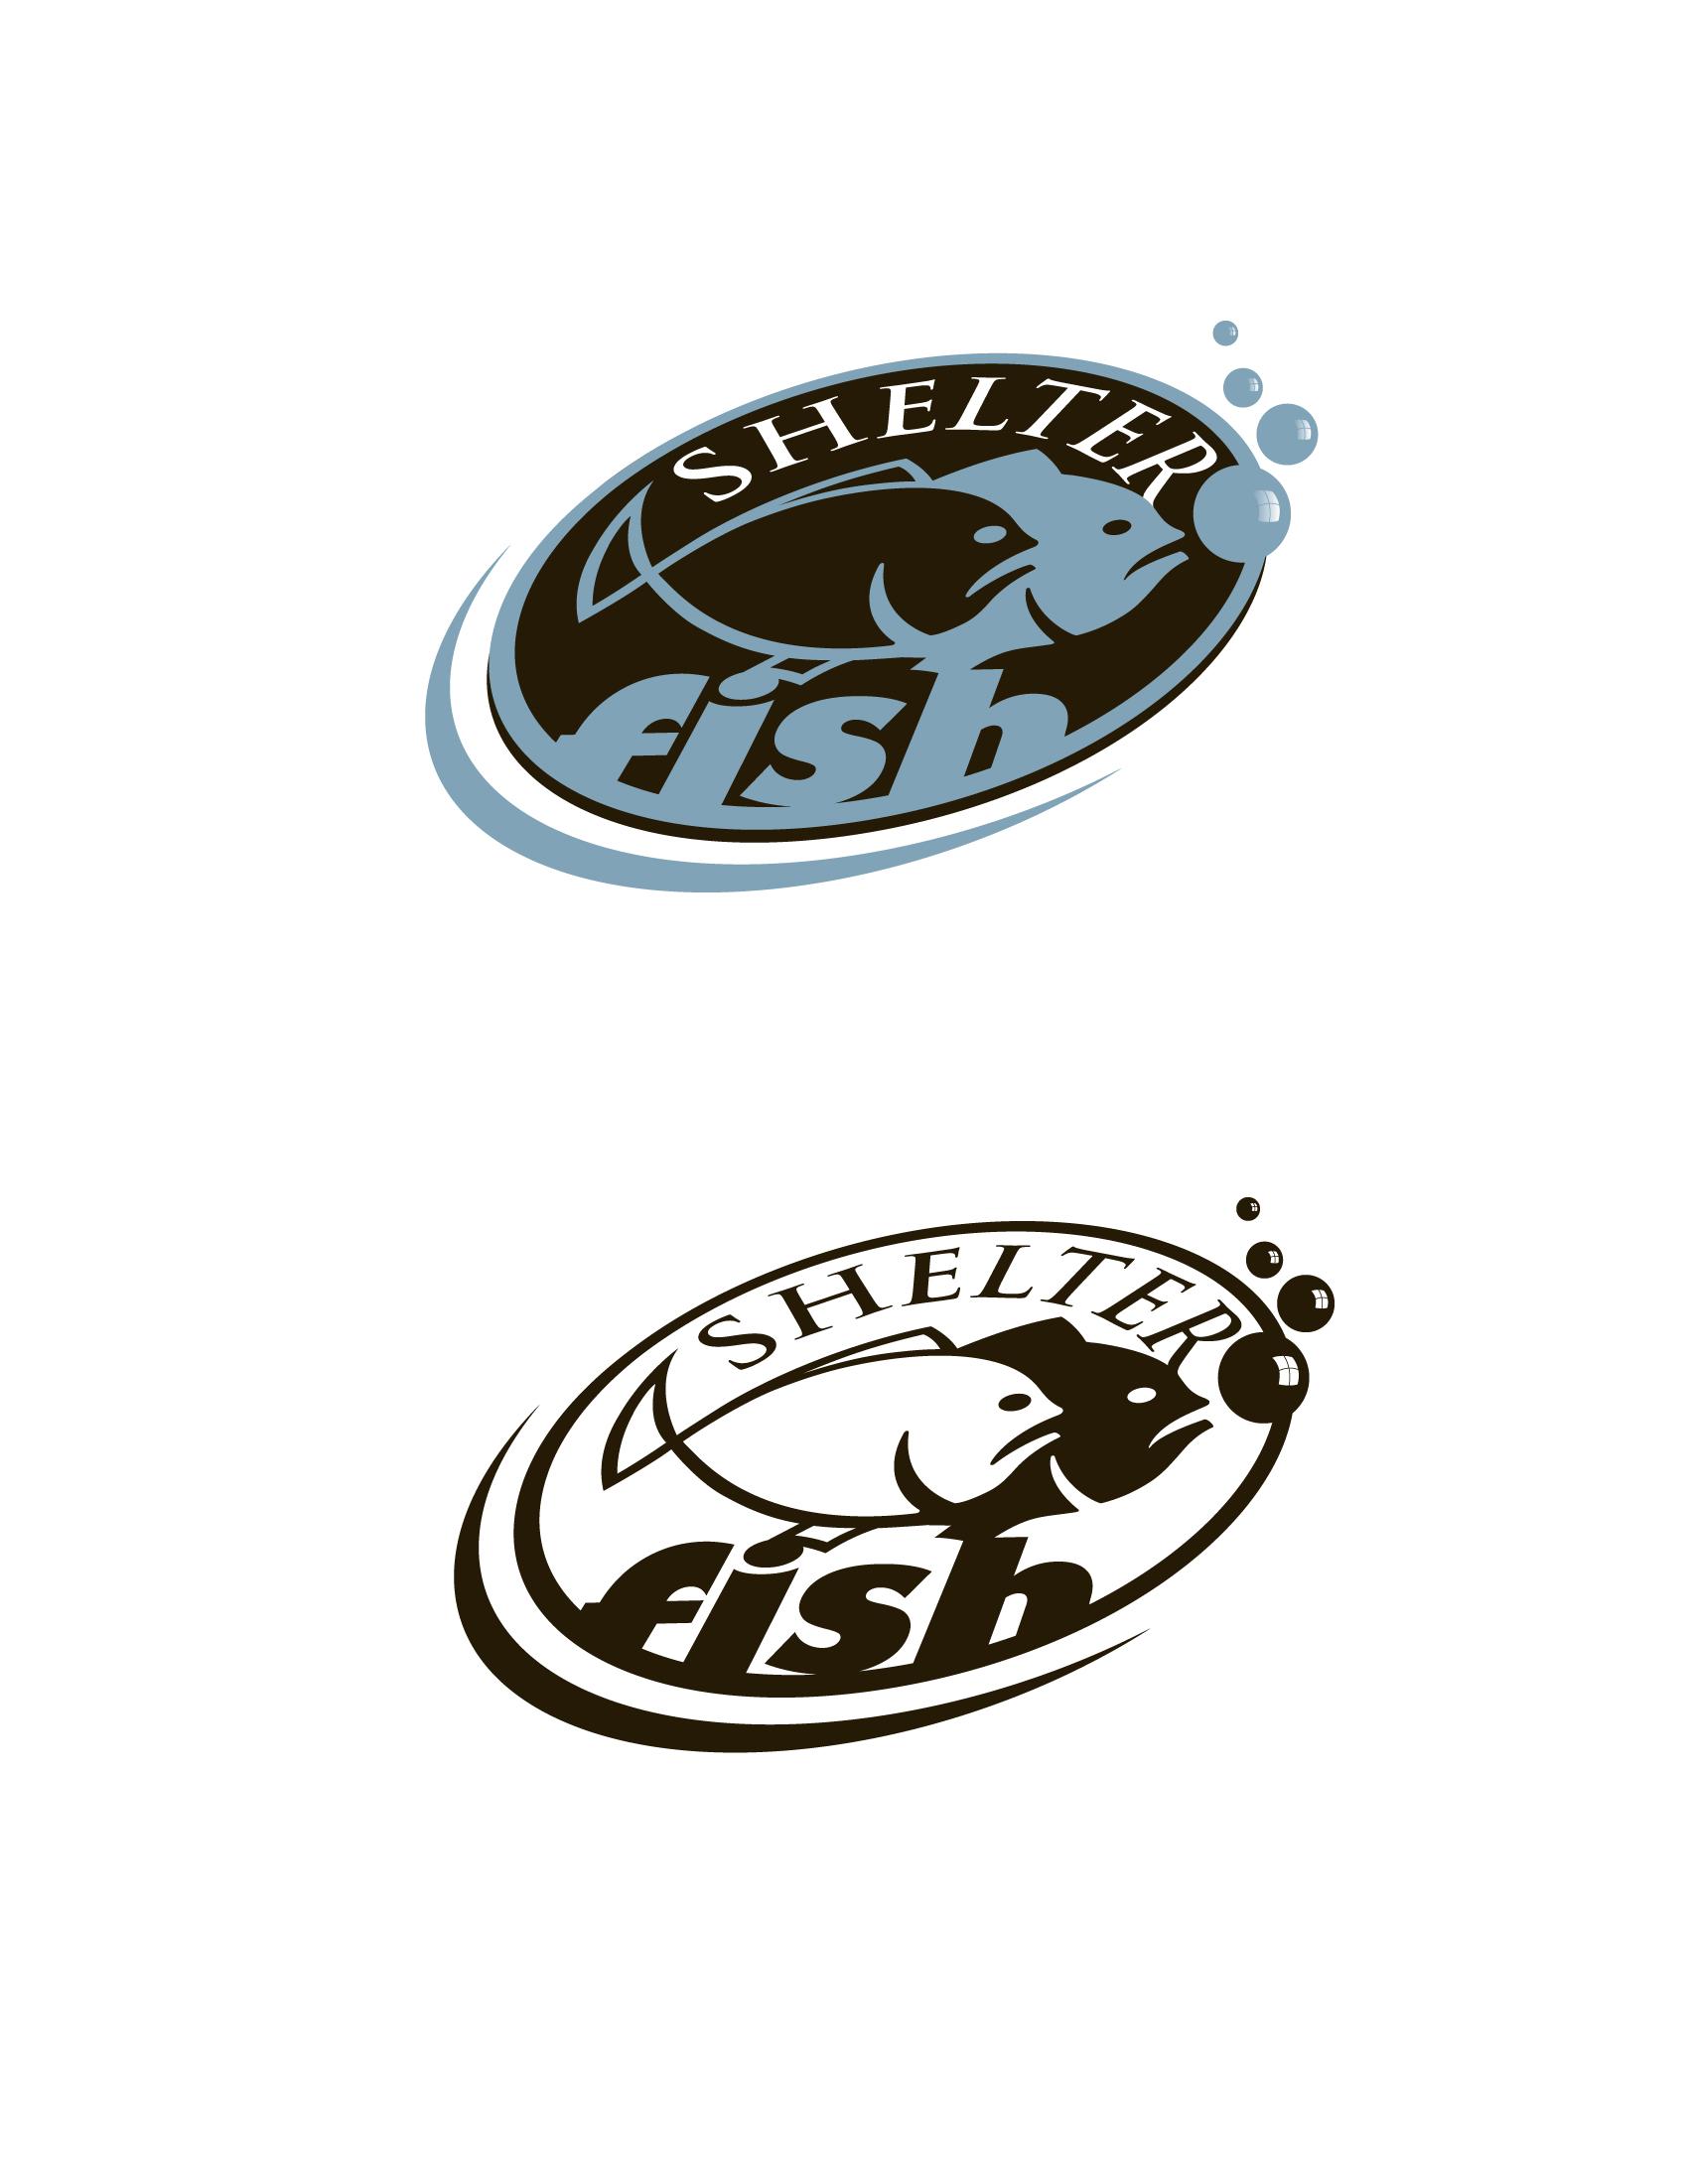 SHELTER FISH logo 2.jpg